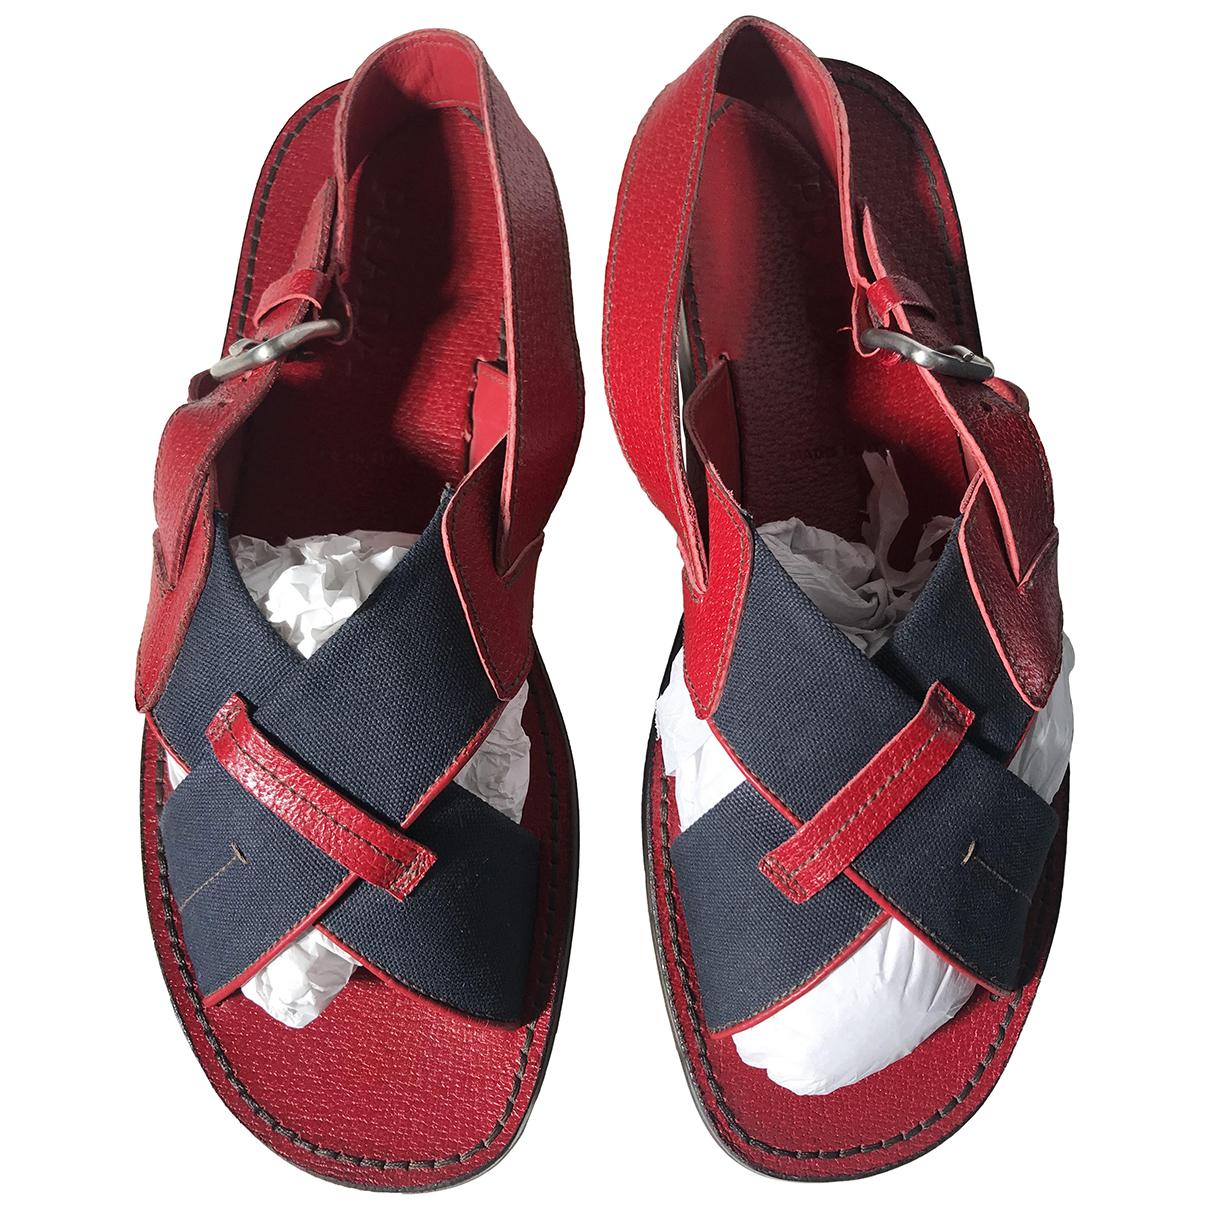 Prada N Red Leather Sandals for Men 43 EU